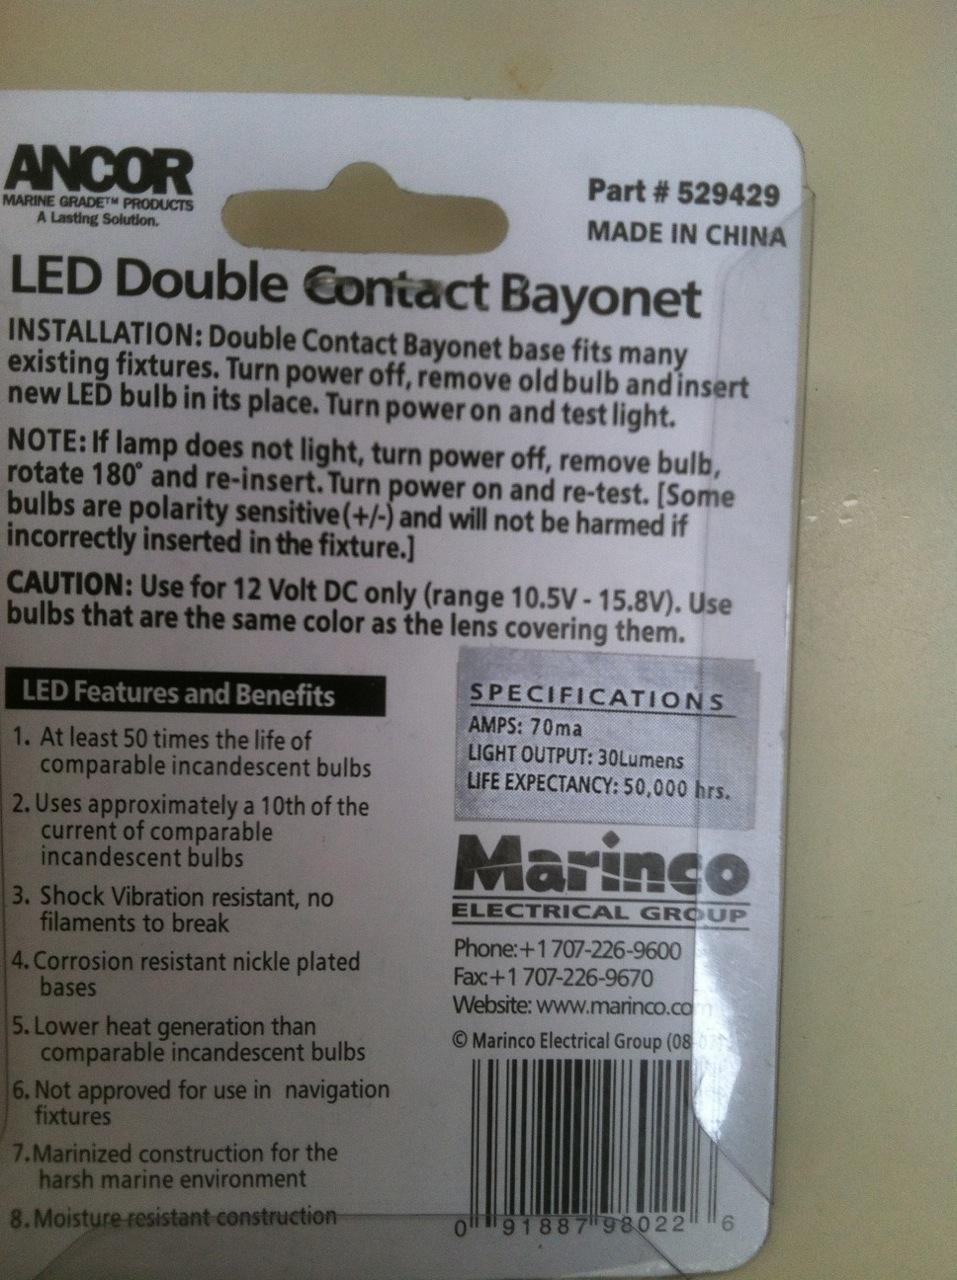 Dc Electrical Panel Replacement J 30 Class Association 3 Wire Diagram Marinco Led Bulb Bayonette Specs